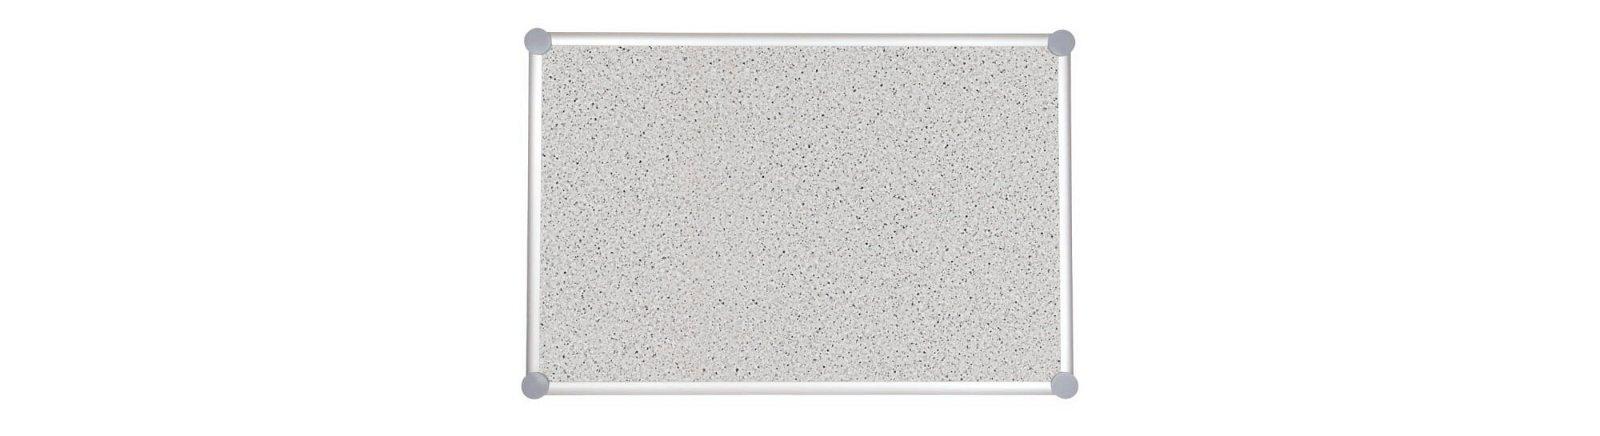 Pinnboard 2000 MAULpro, Struktur, 90x120 cm, grau